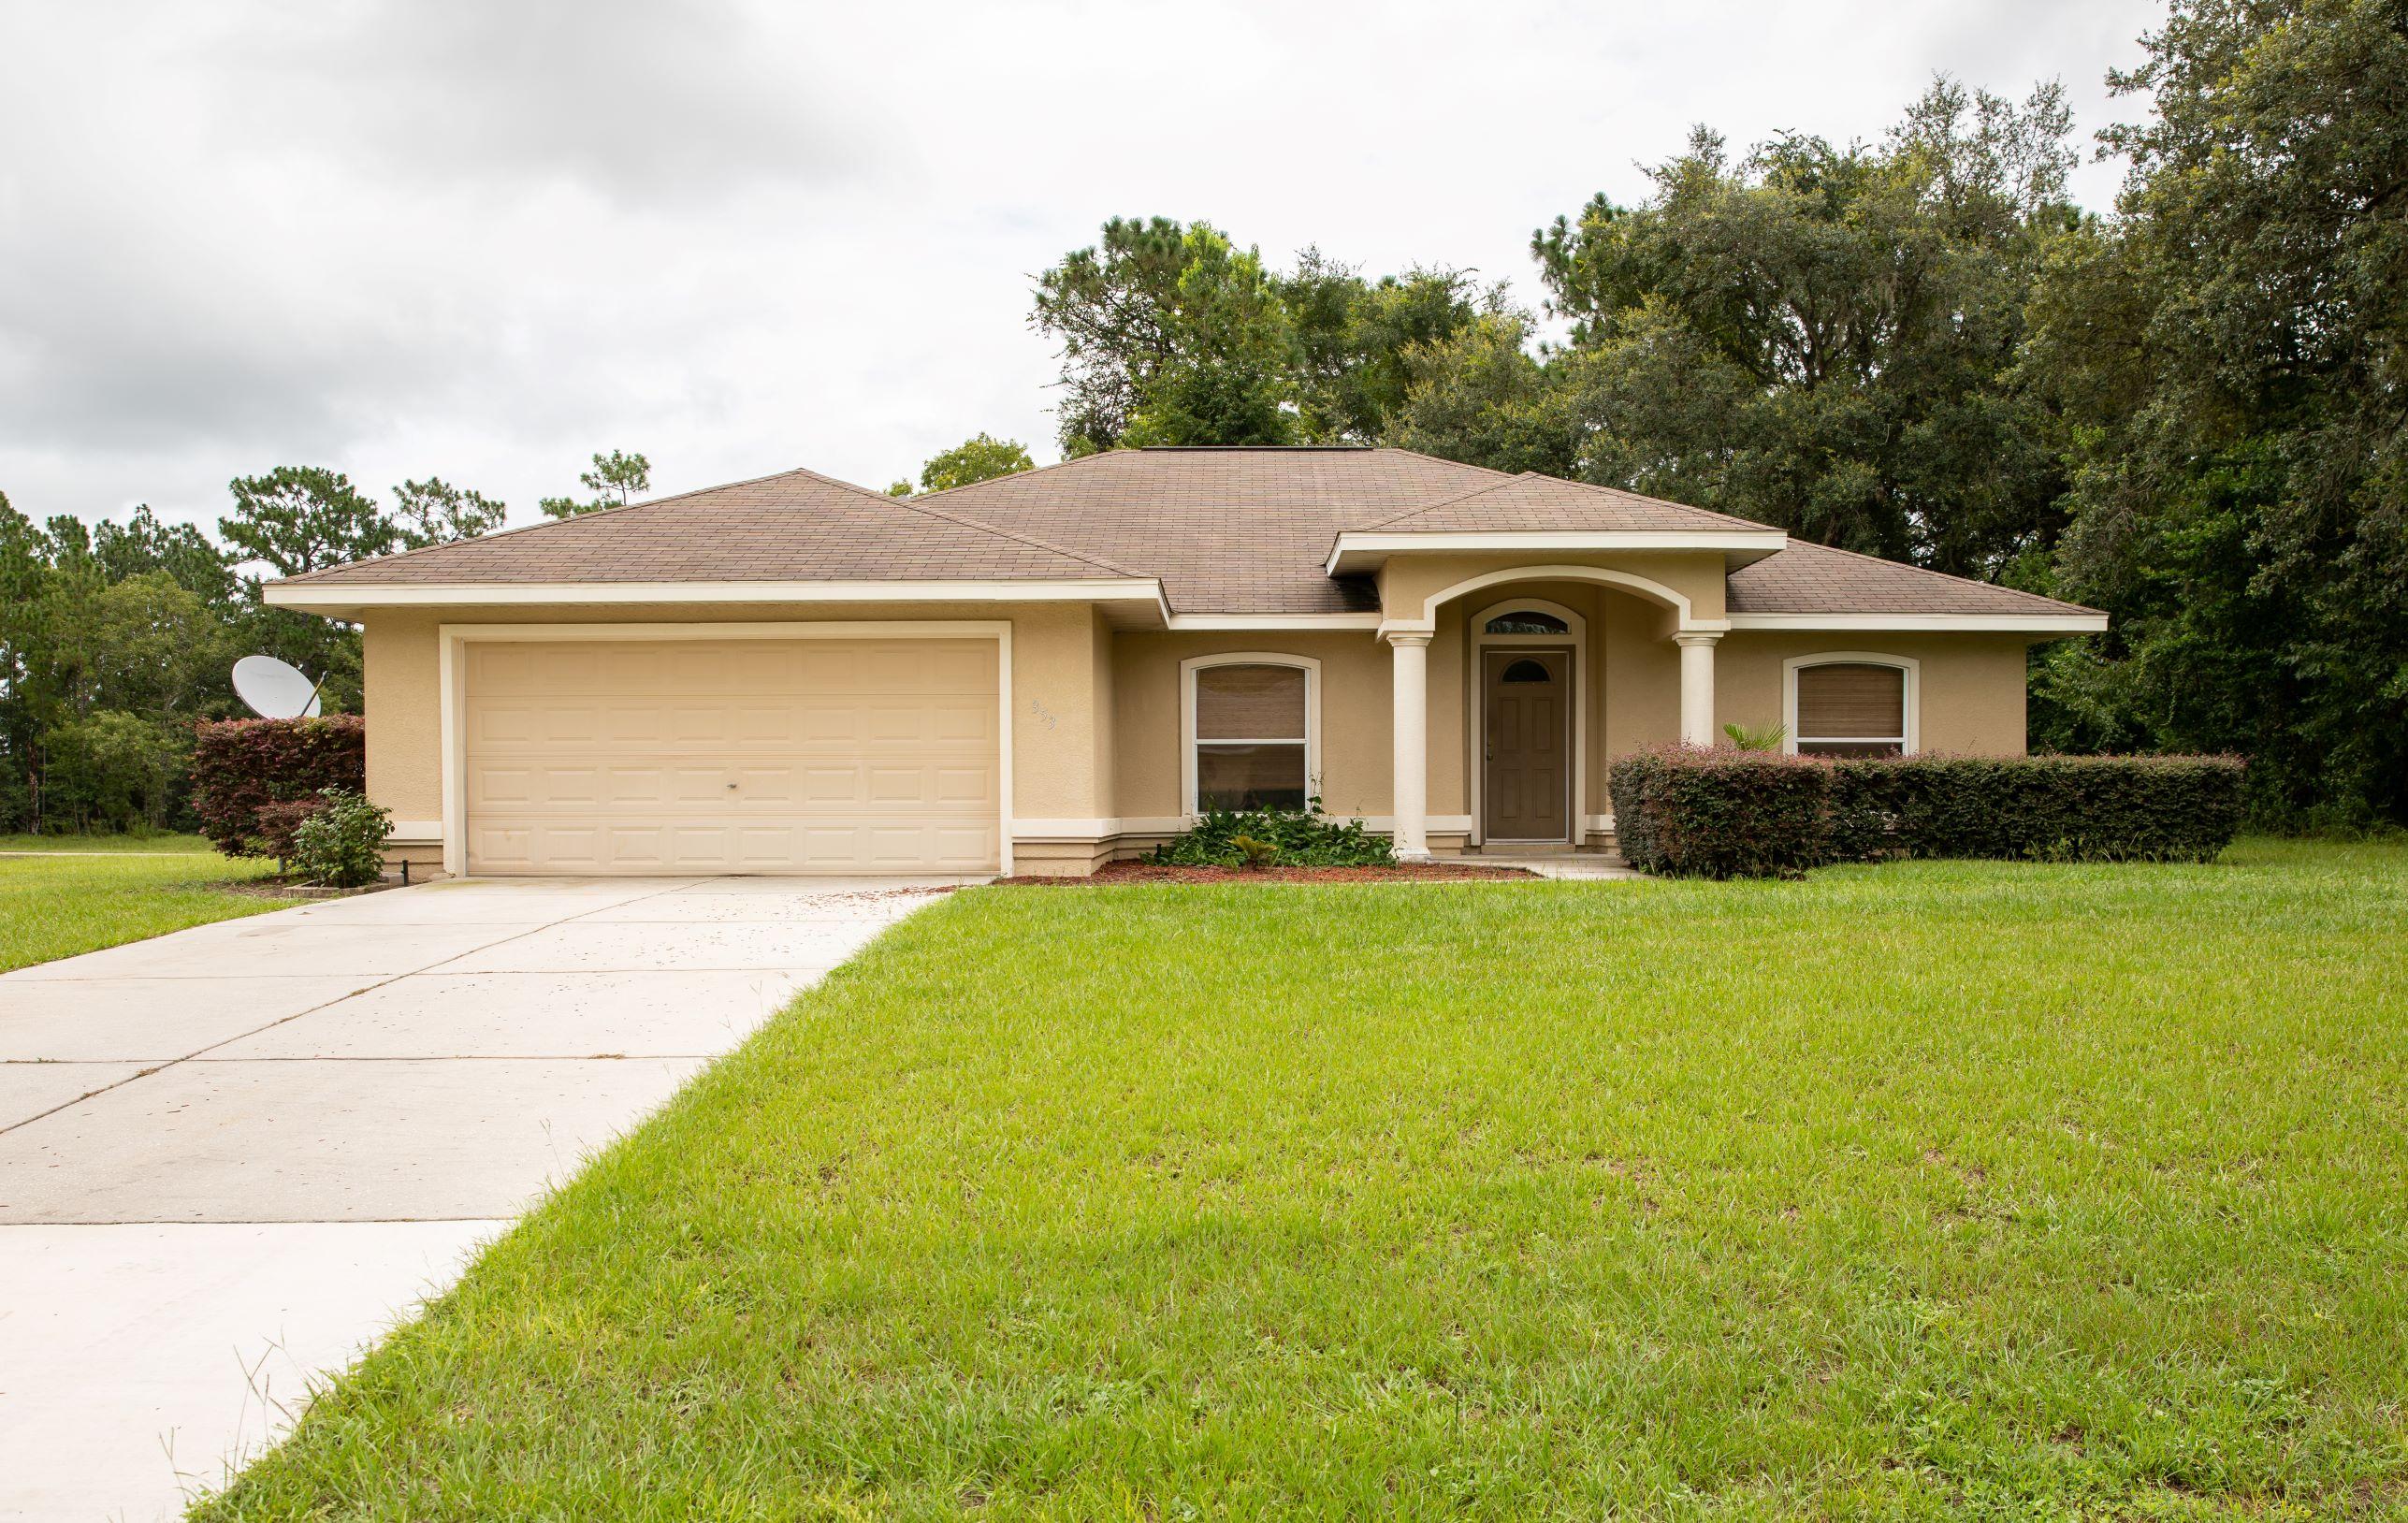 353 Marion Oaks Pass, Ocala, FL 34473  - ocala fl home for sale